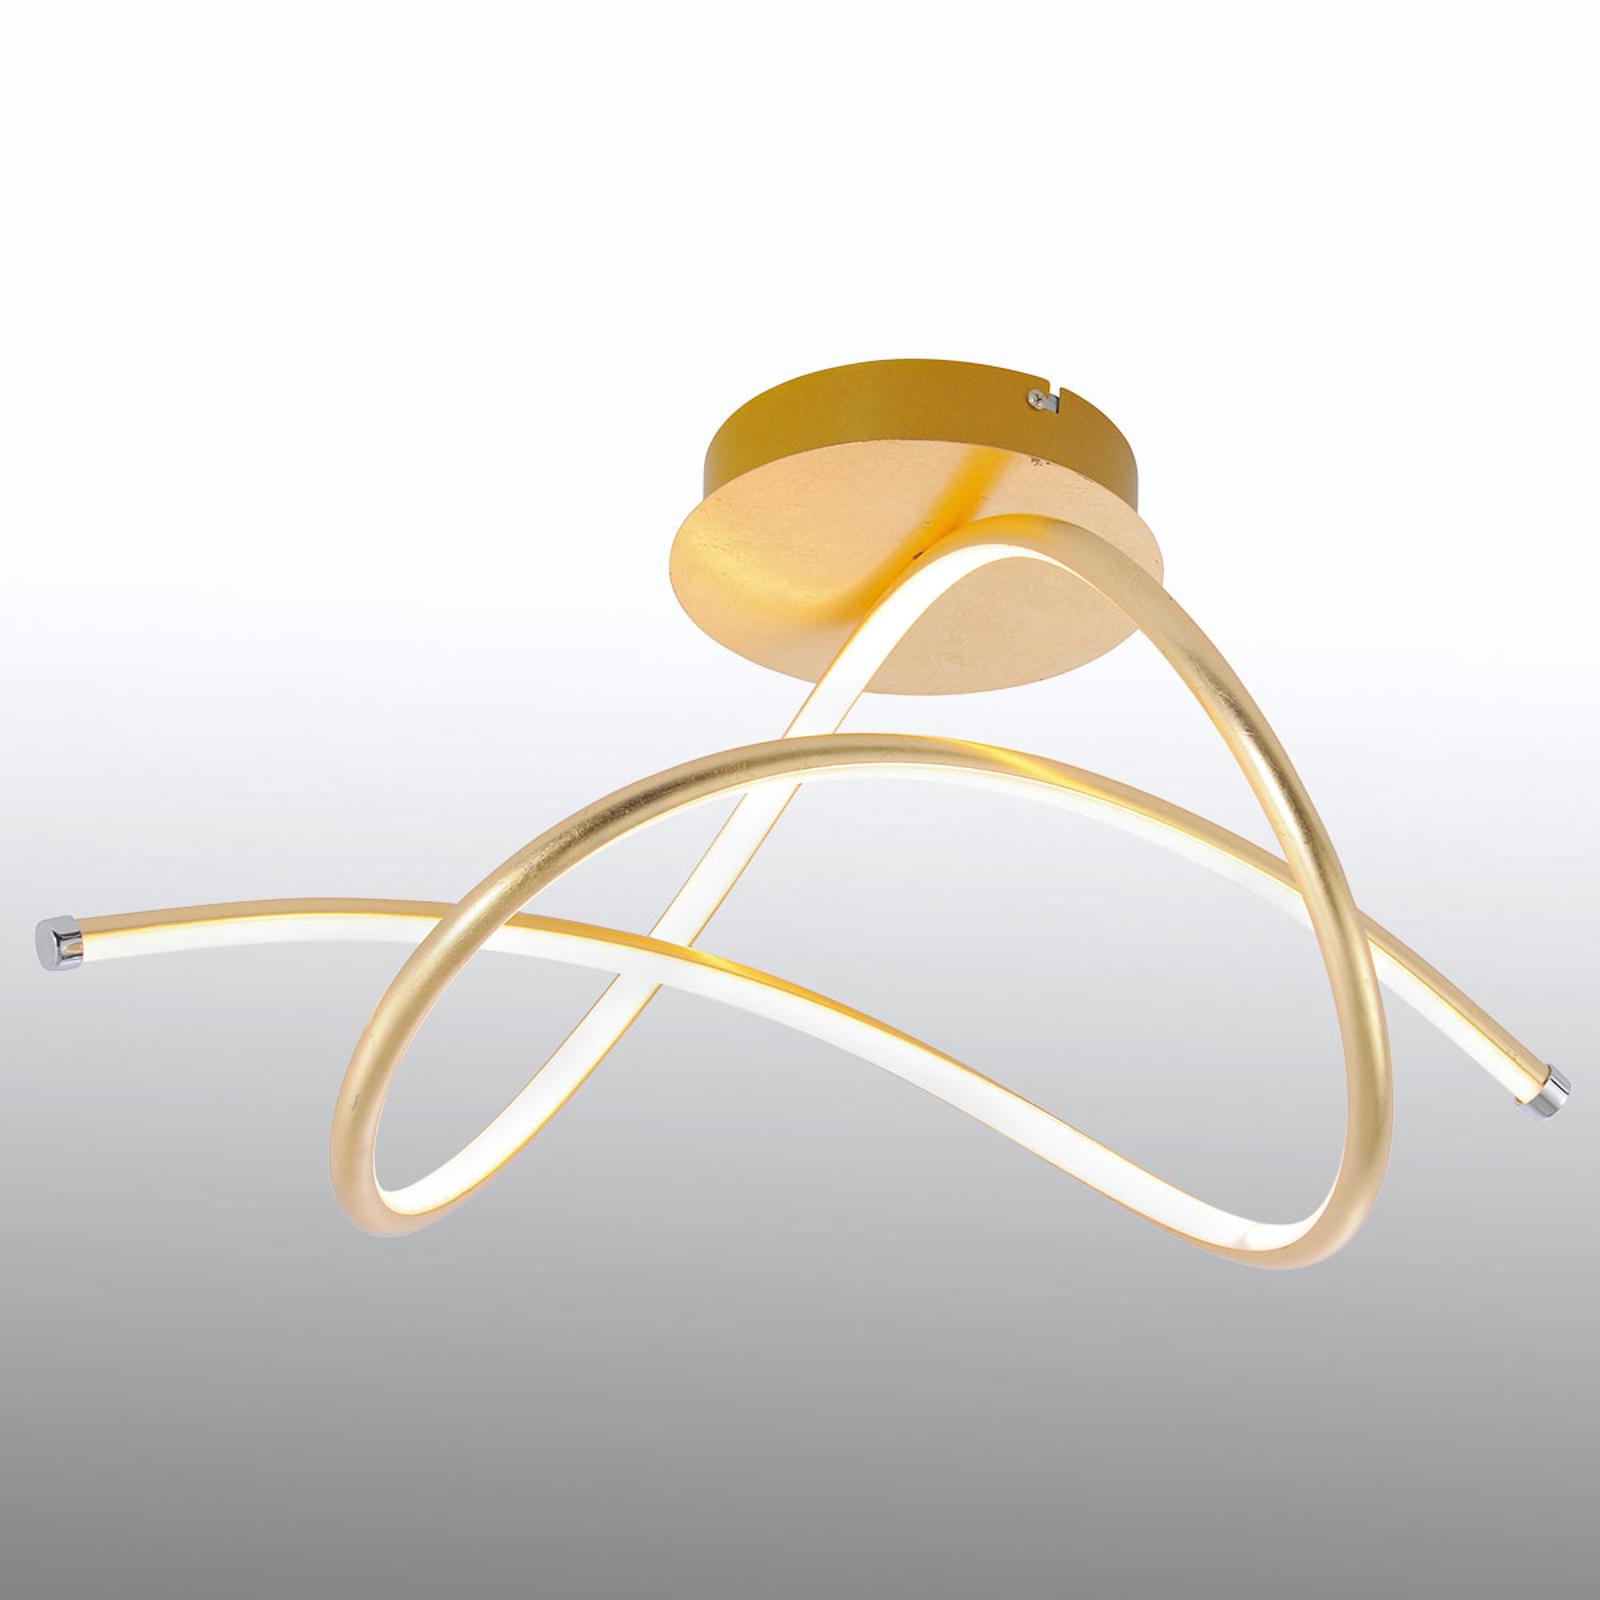 LED-taklampe Violetta, buet, gull